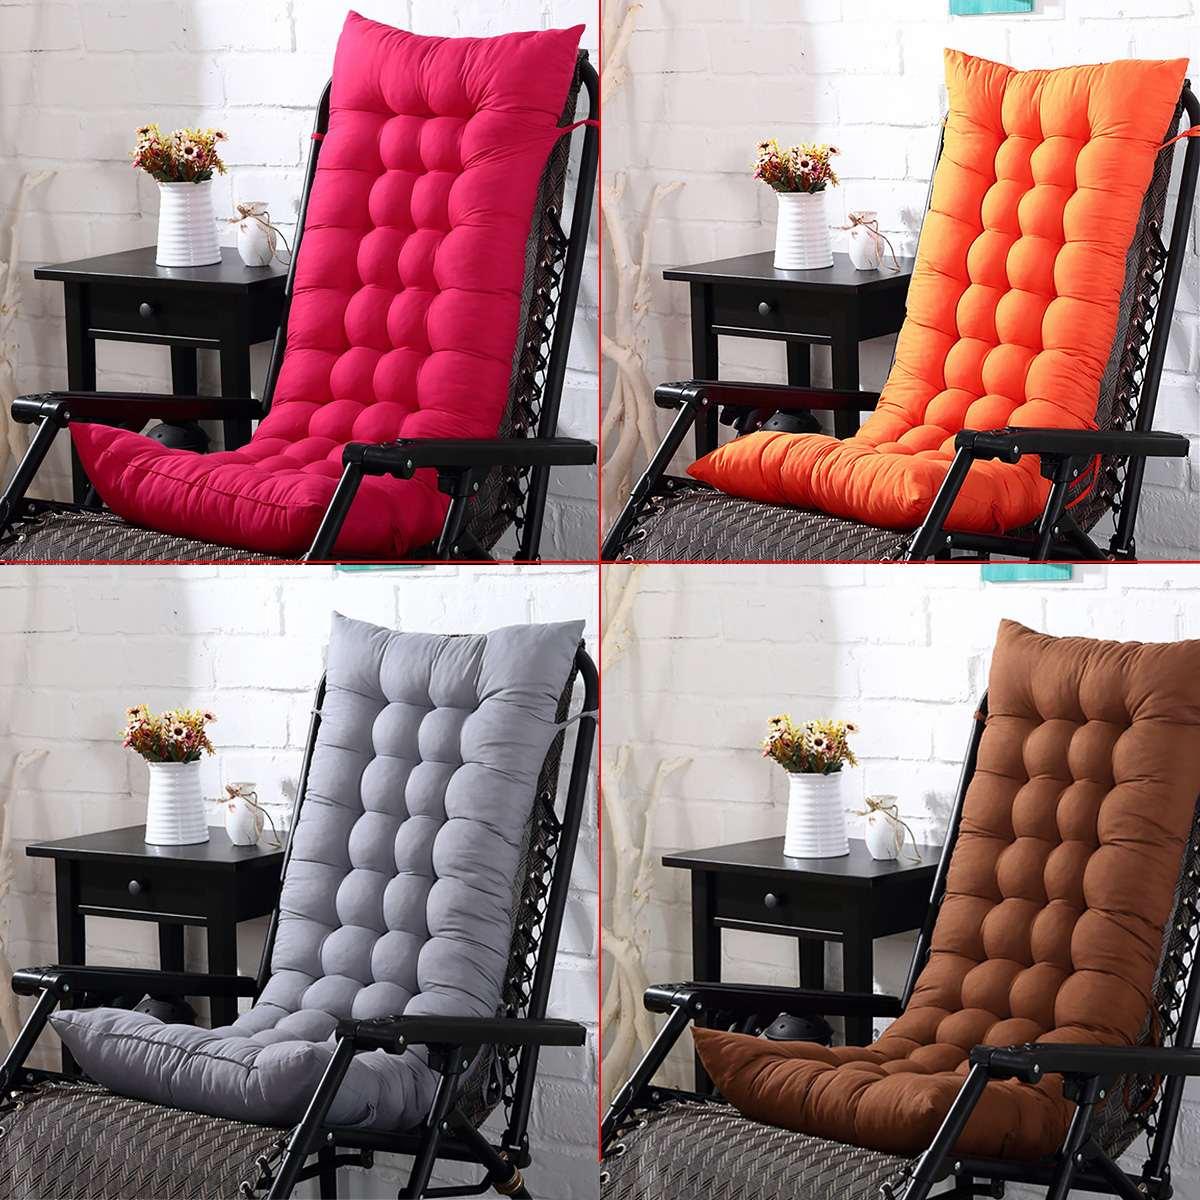 Lounge Chair Cushion Soft Relaxing Lazy Sofa Seat Cushion Floor Deck Chaise Pad Patio Pool Backyard Garden Home Comfortable